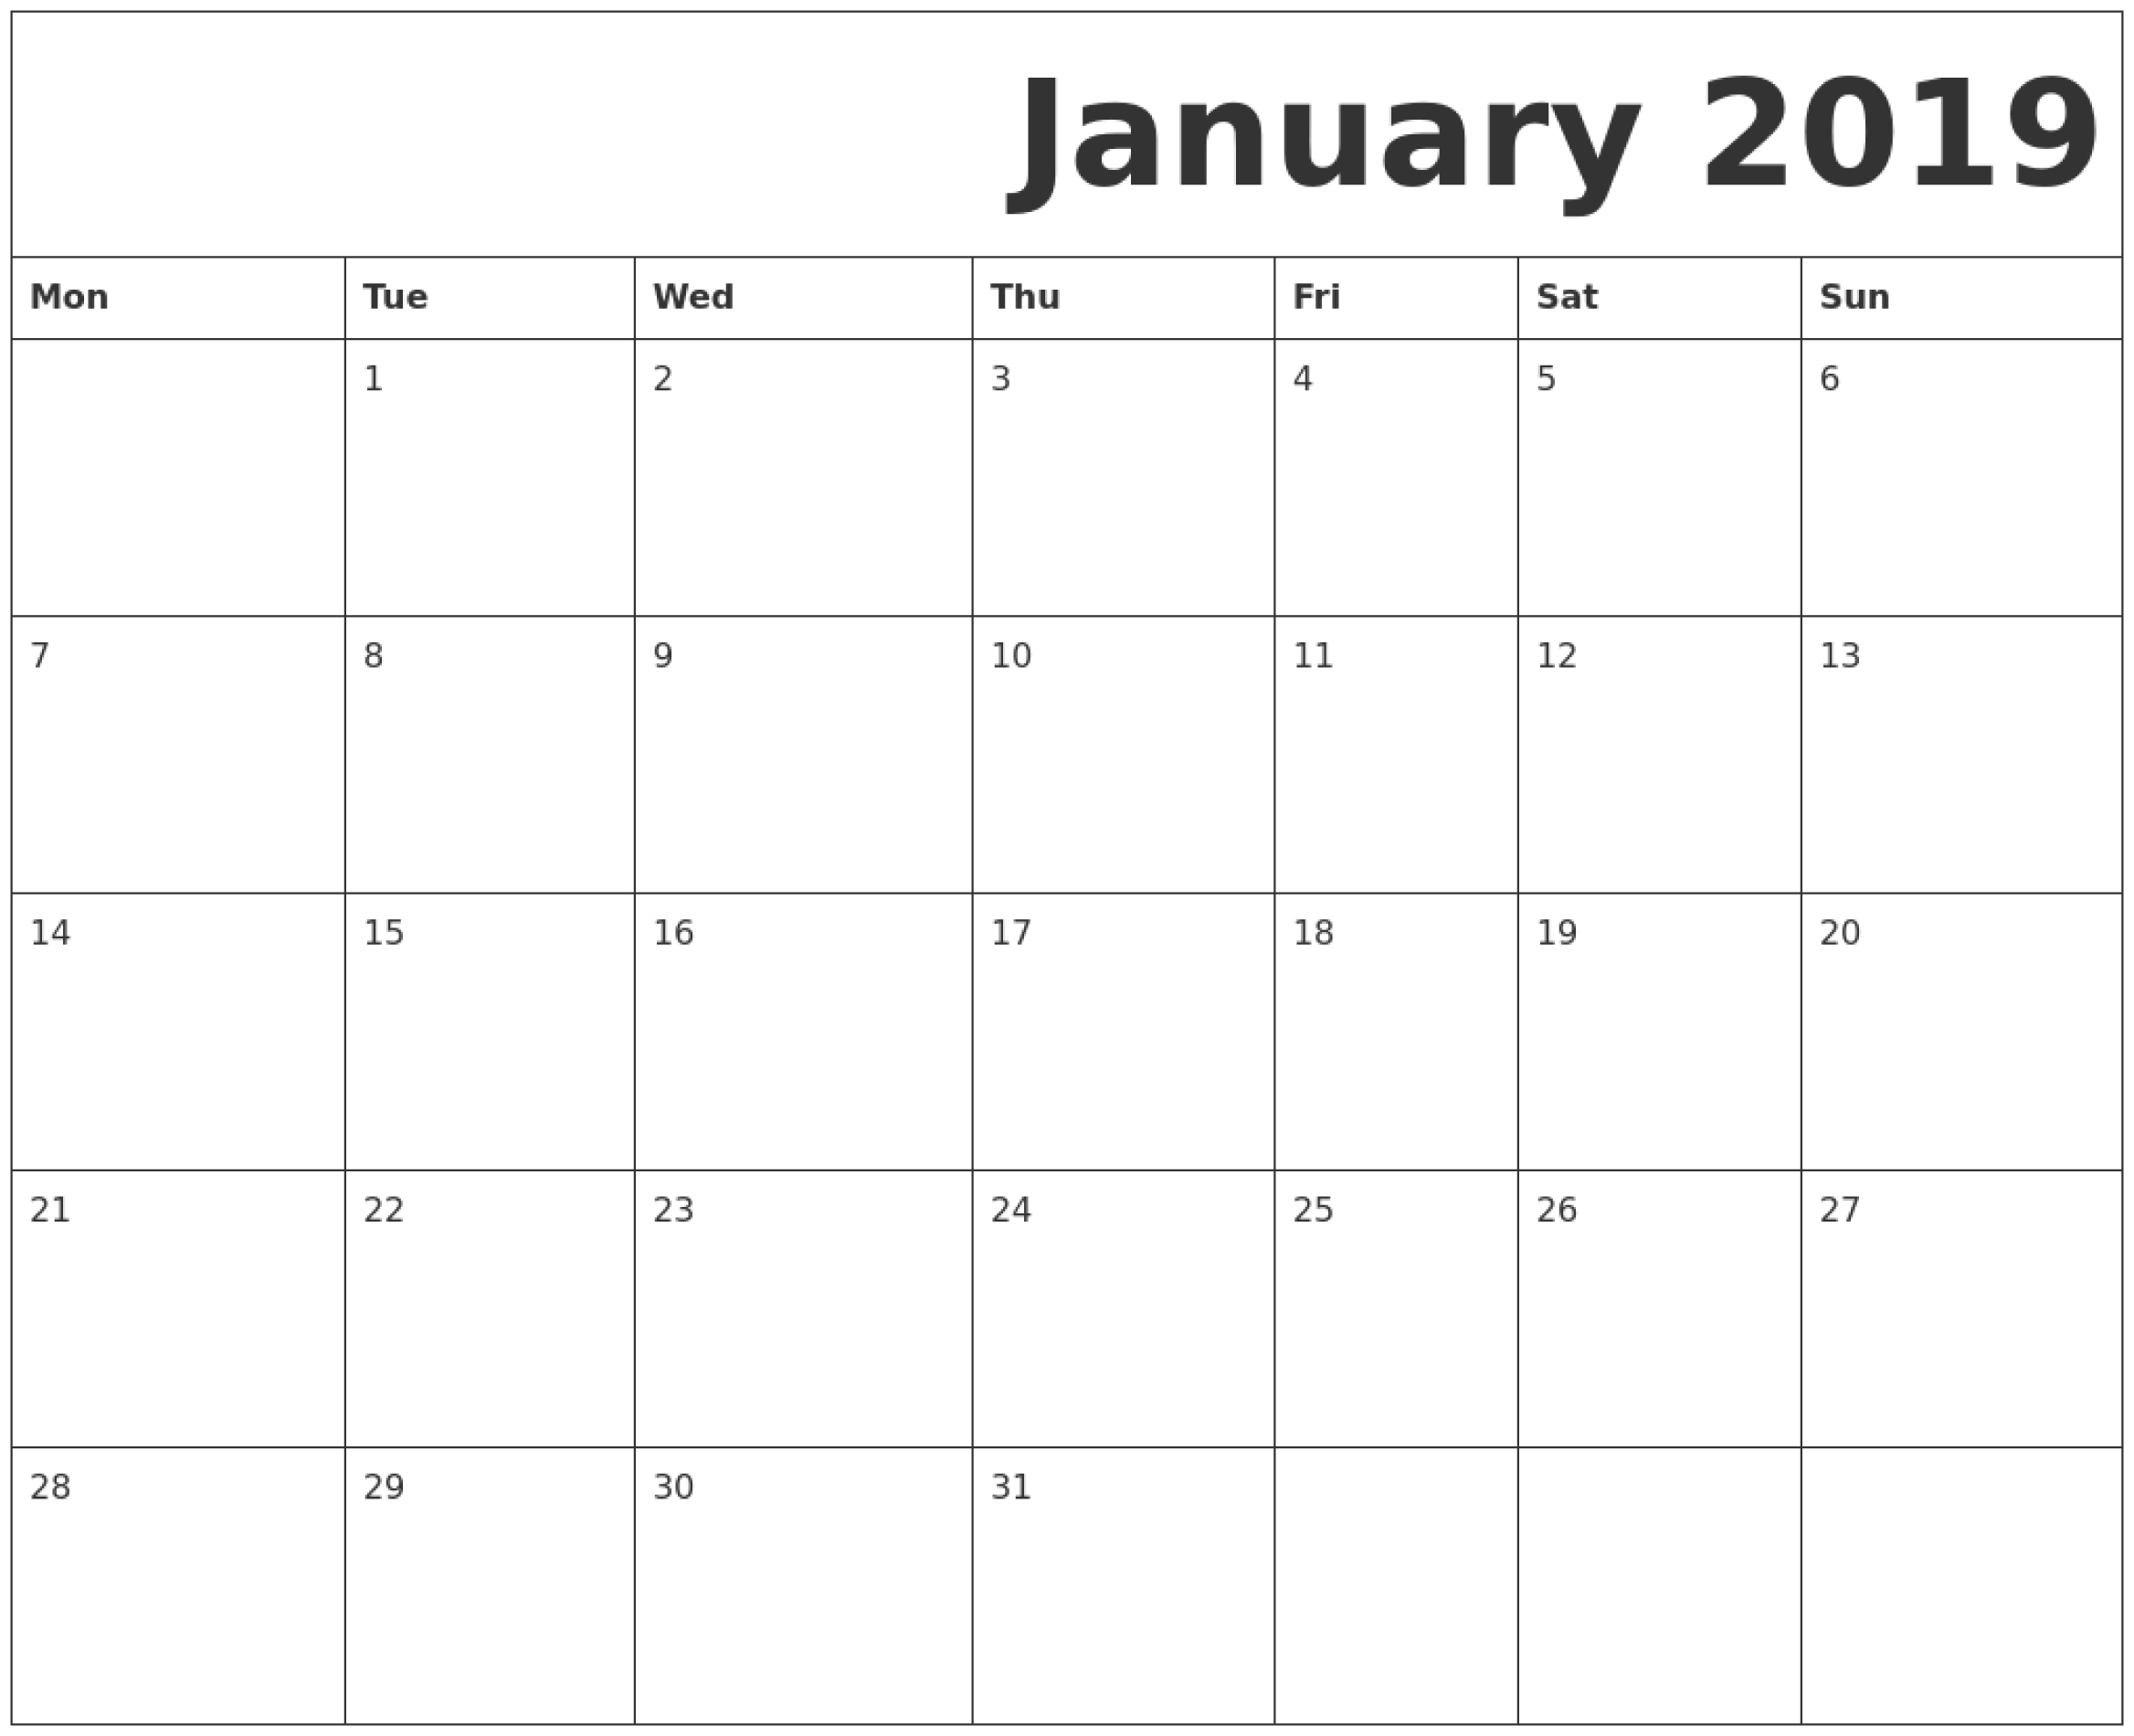 January 2019 Printable Calendar Monday Start. | June Remarkable Free Printable Monthly Calendars Monday Start